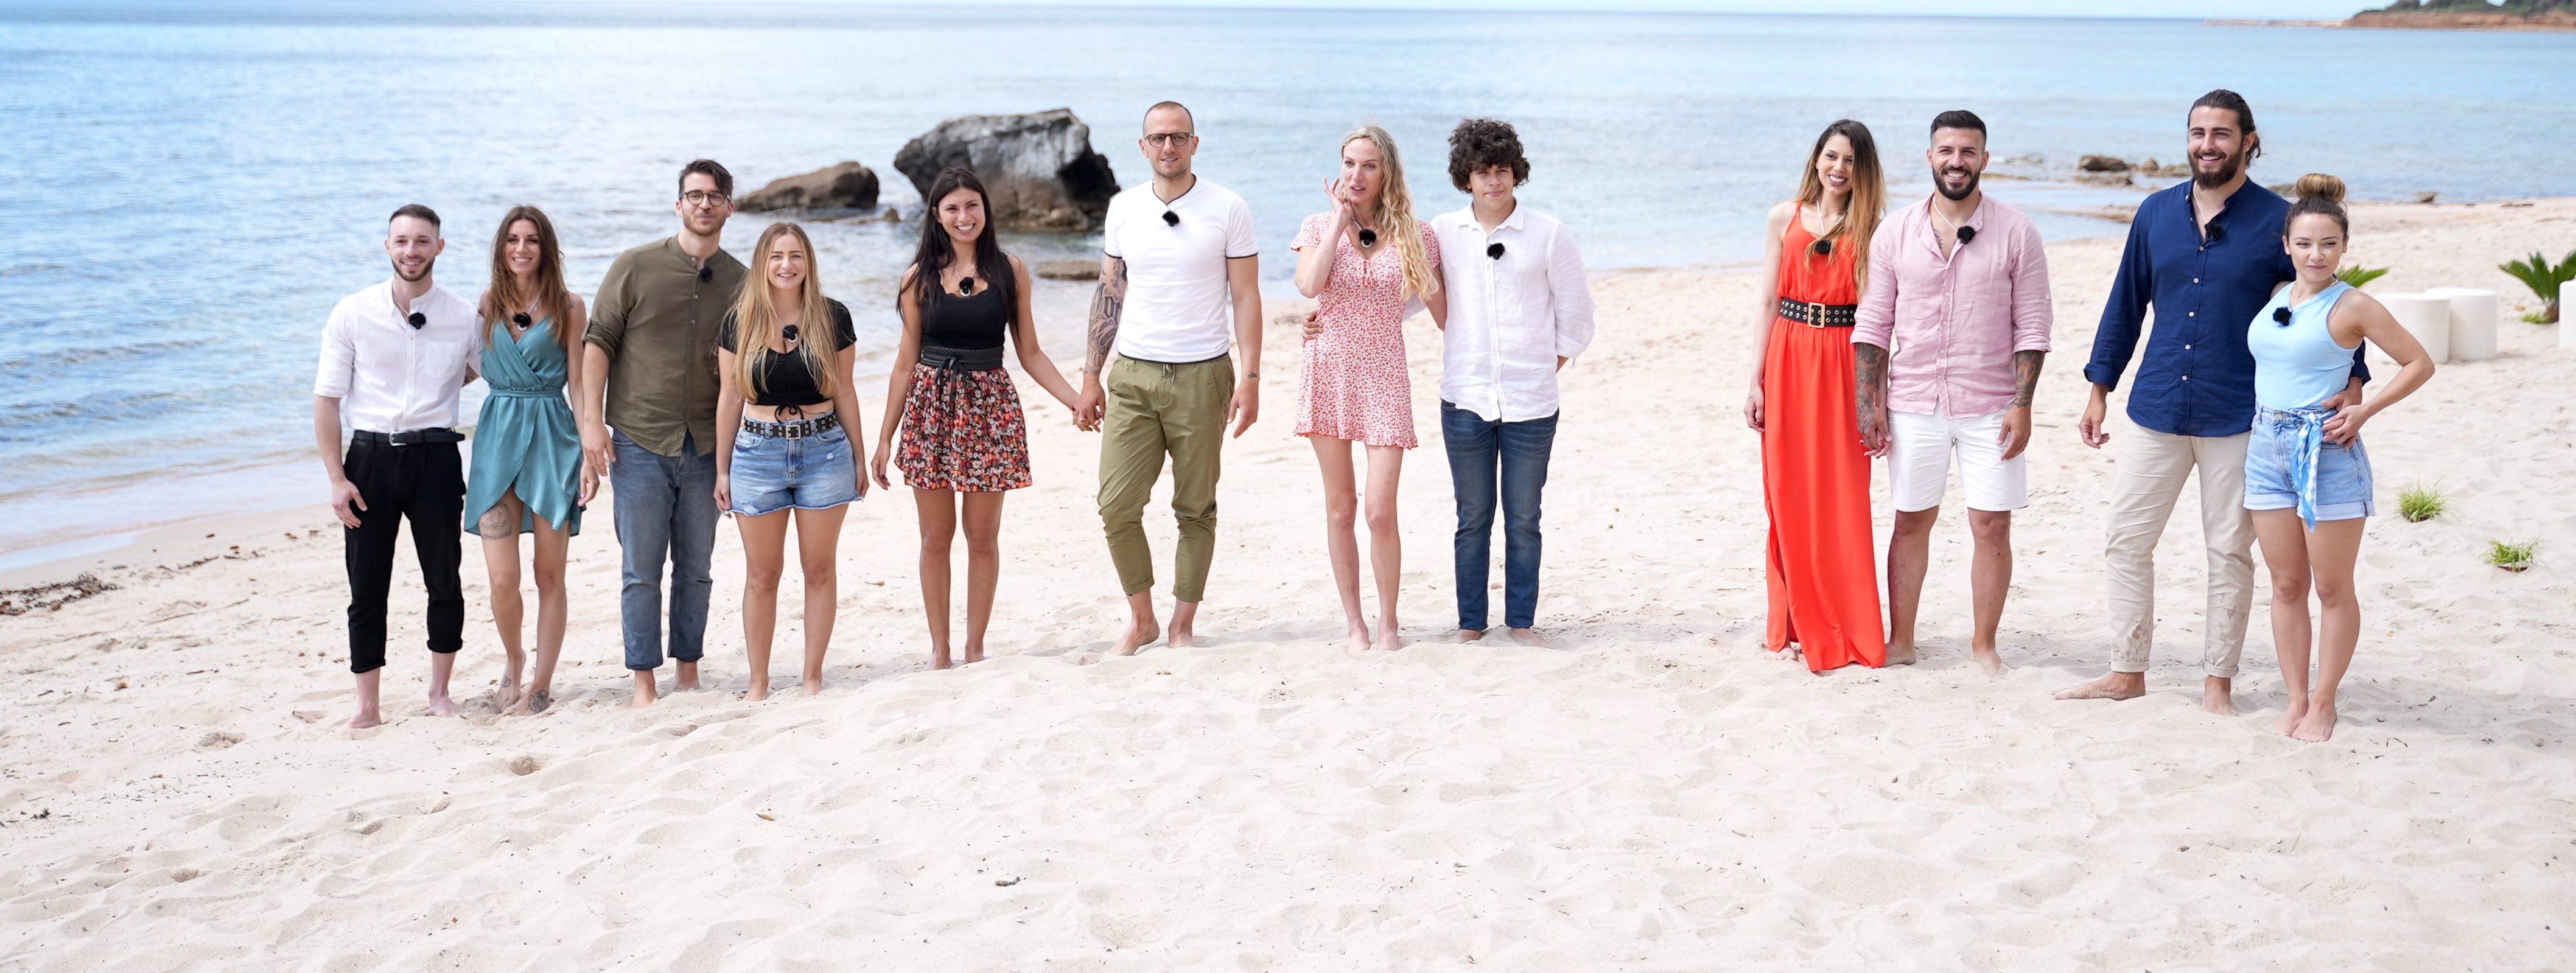 Tv show Temptation Island